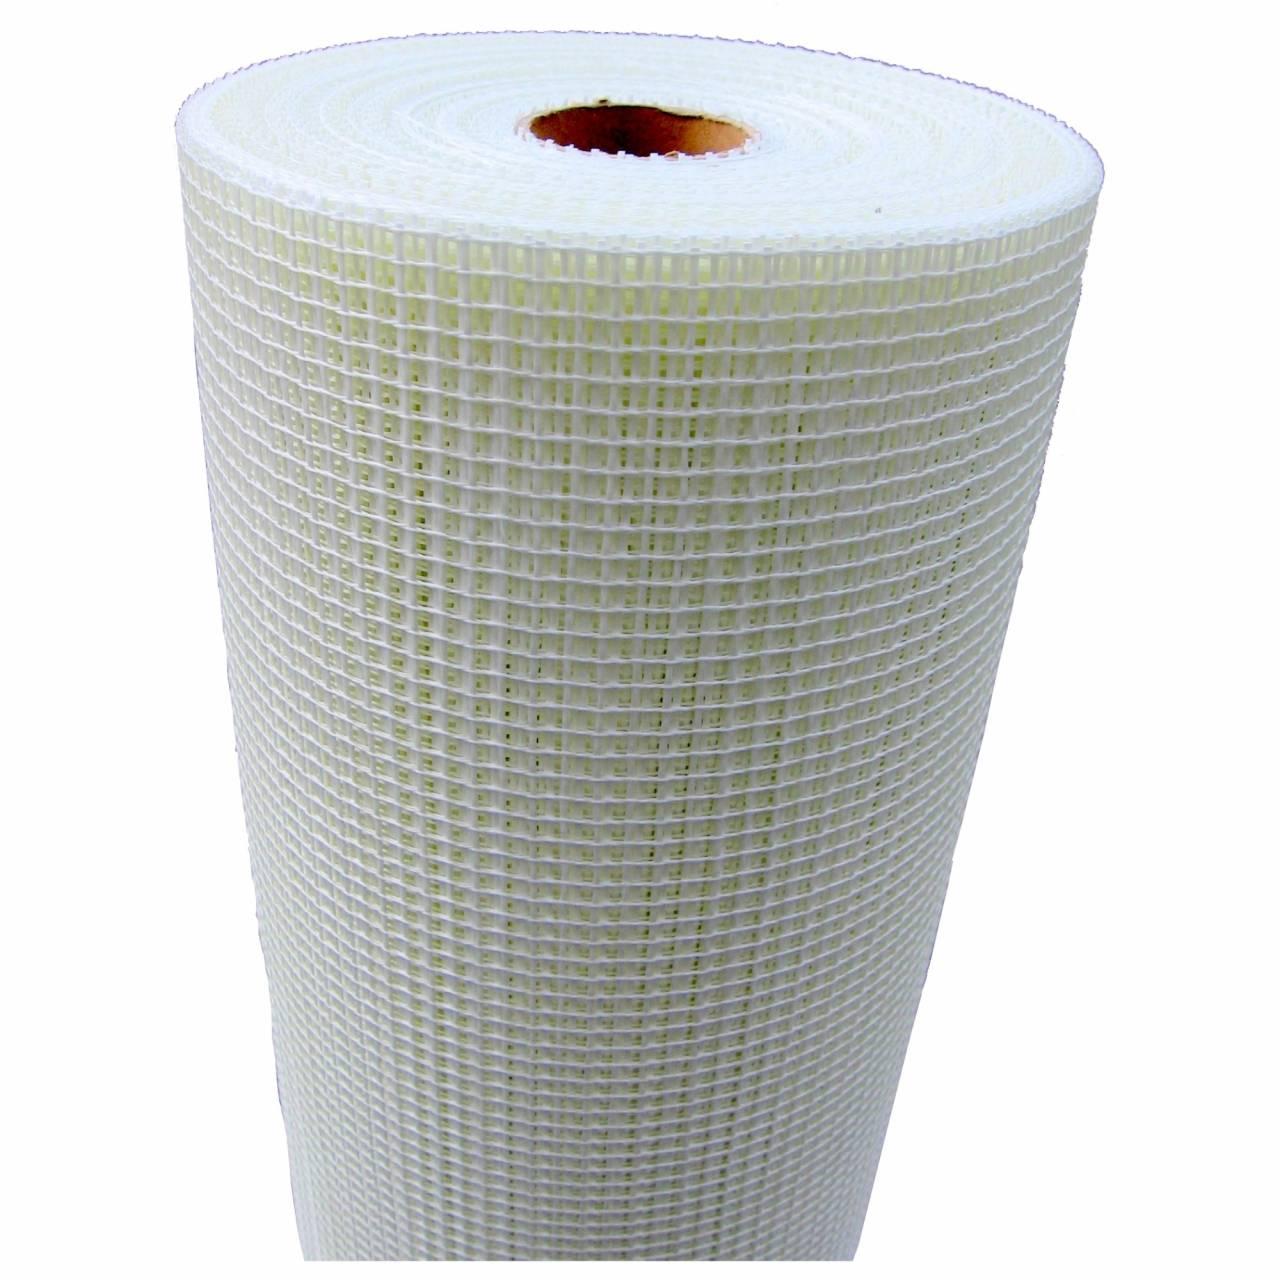 WDVS-Putzgewebe 4 x 4 weiss / Rolle 1,0 x 50 m